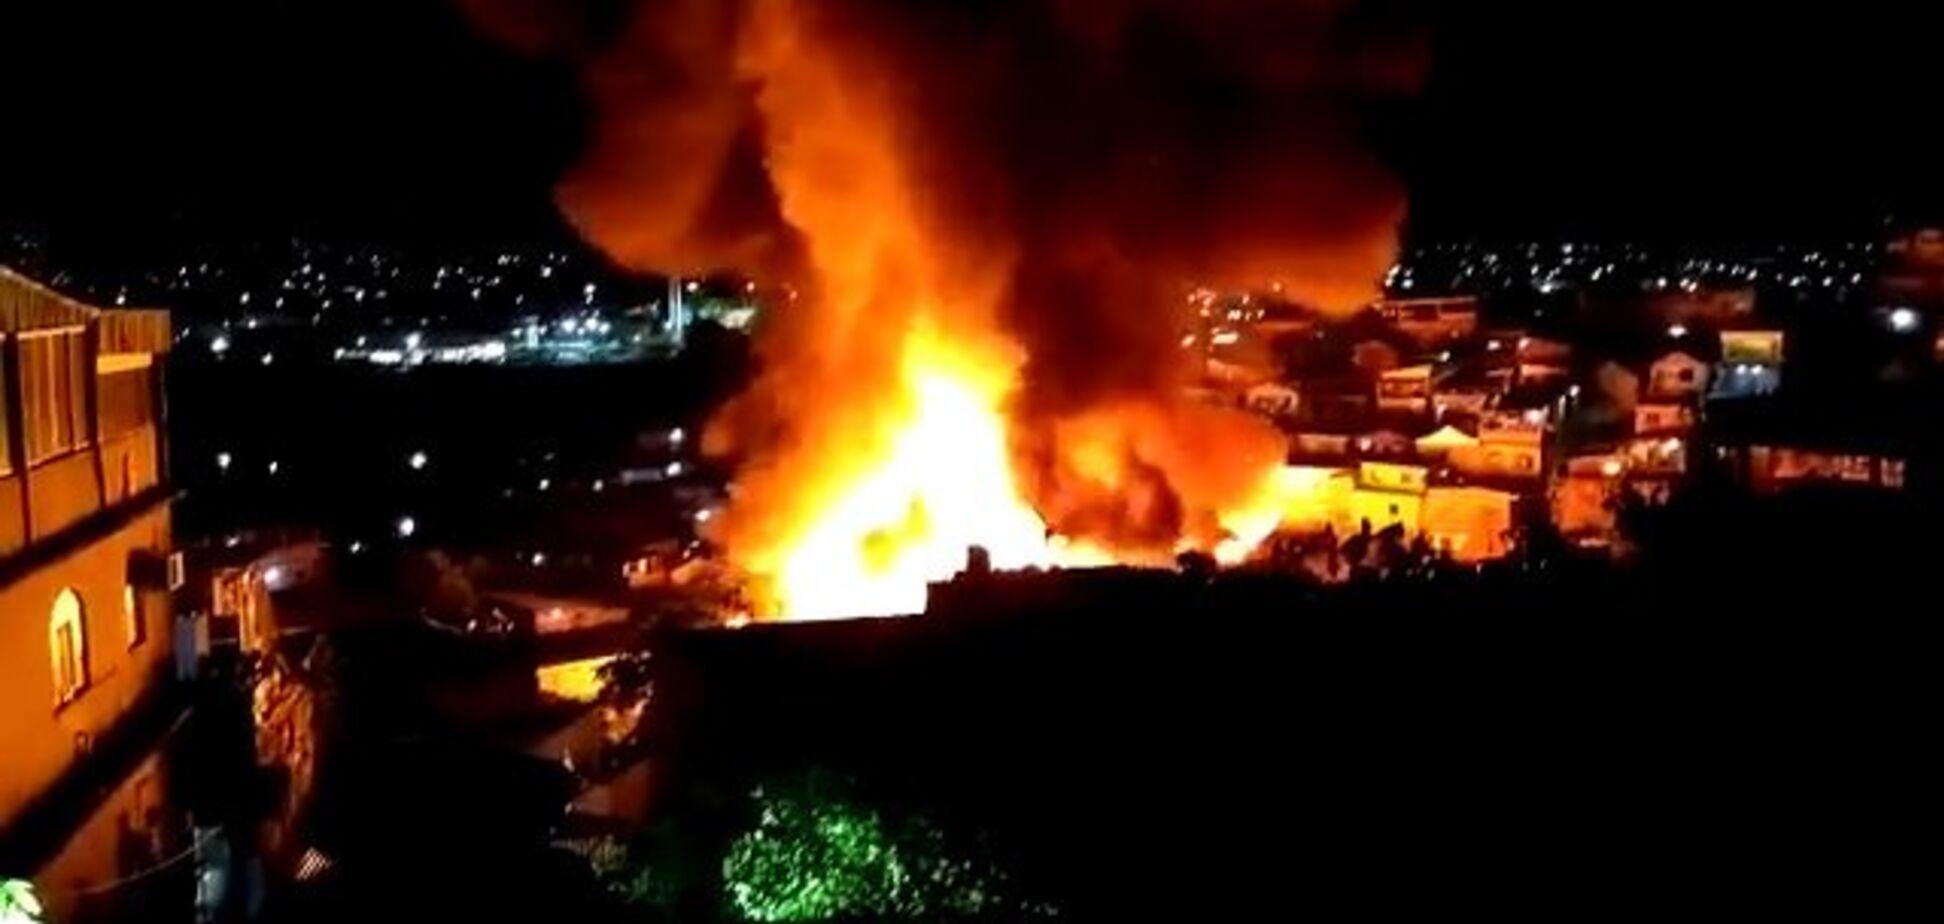 Близько 600 будинків знищила потужна пожежа